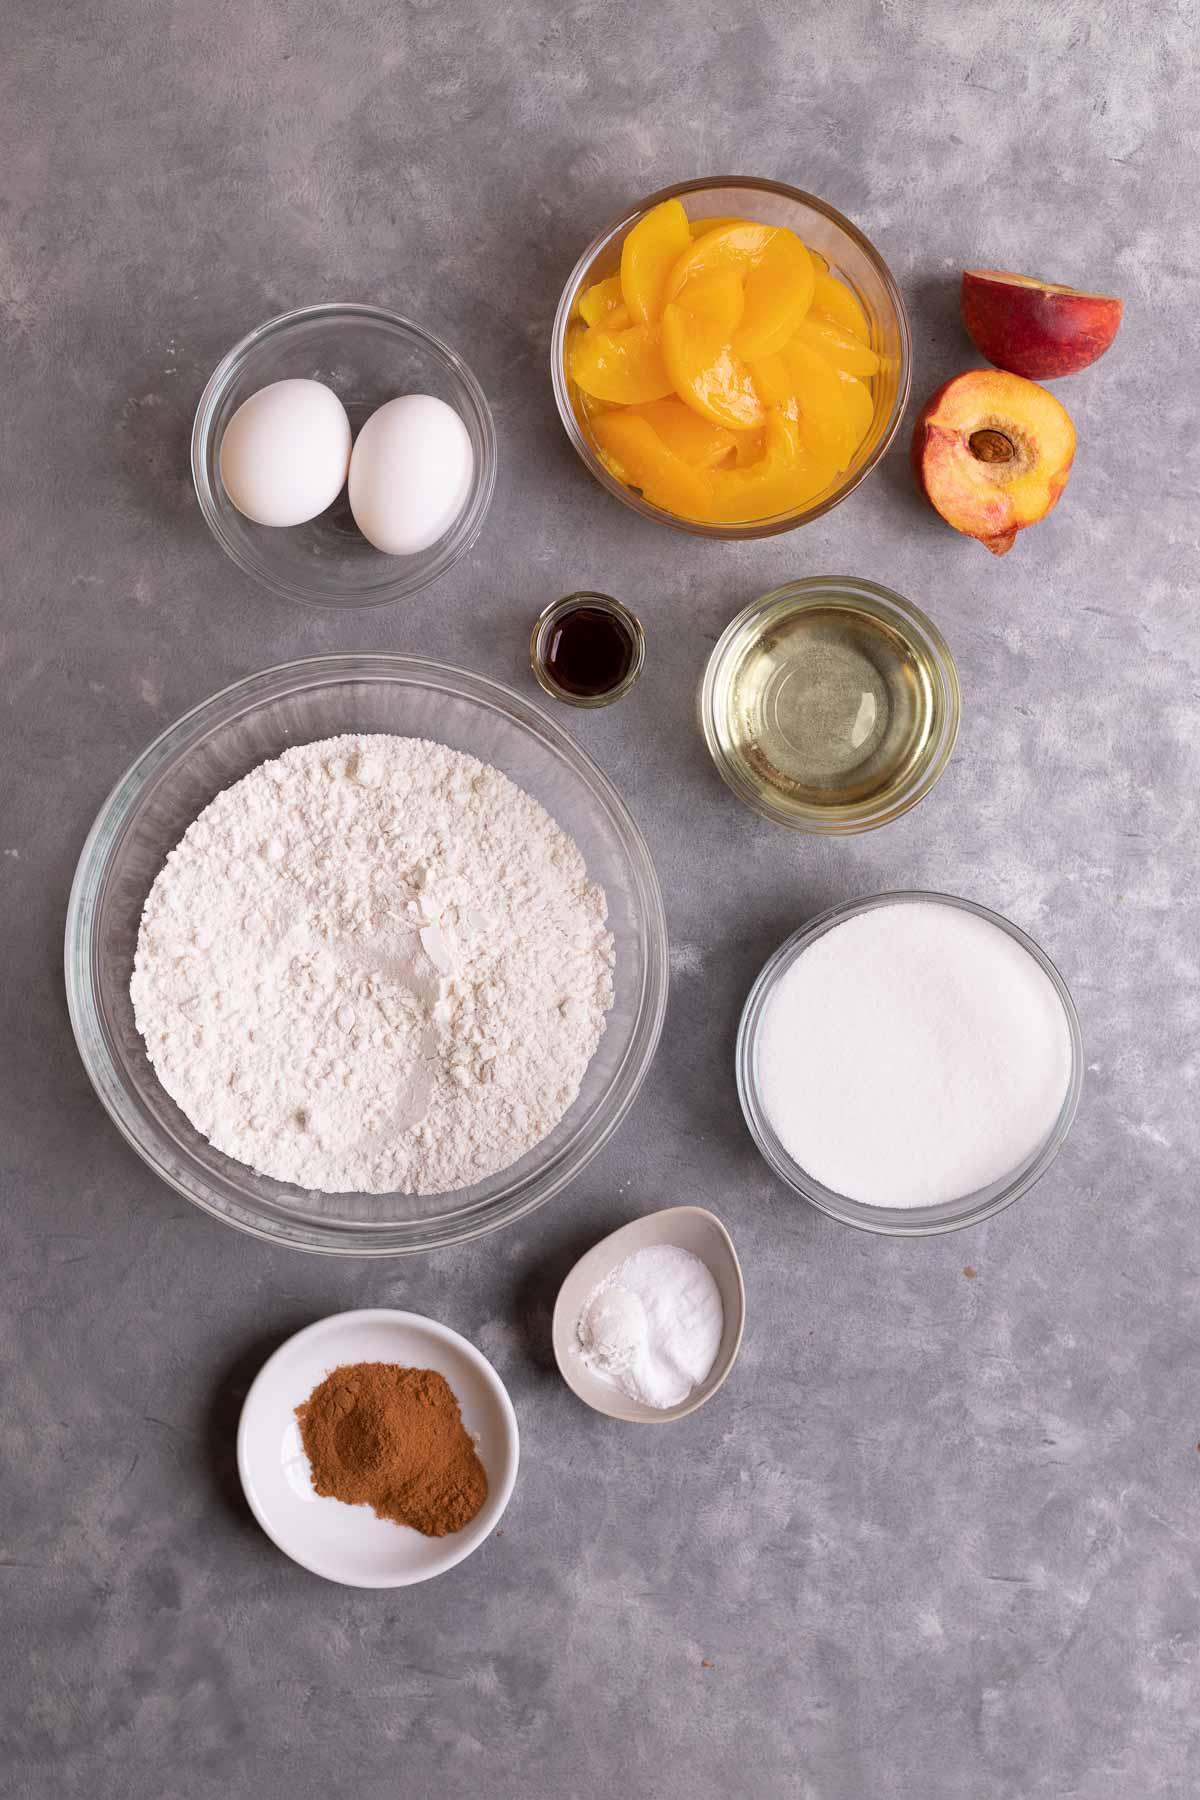 Ingredients for Cinnamon Peach Bread in prep bowls